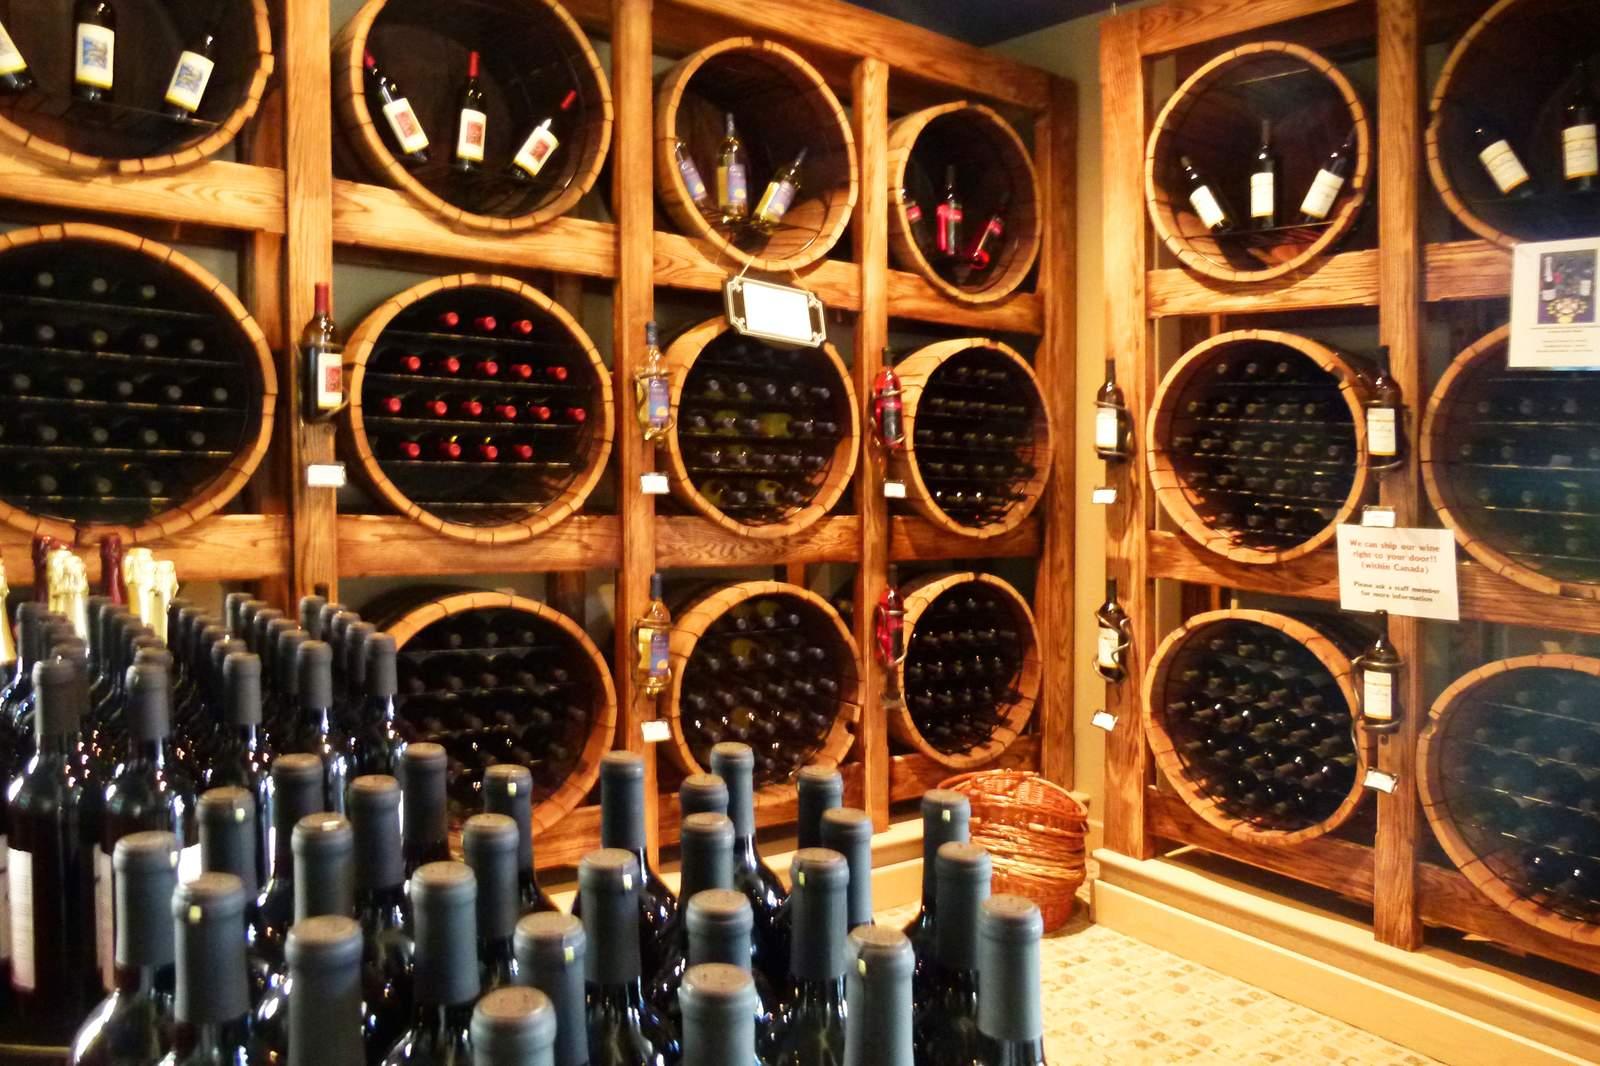 Weinkeller des Domaine de Grand Pre Weinguts